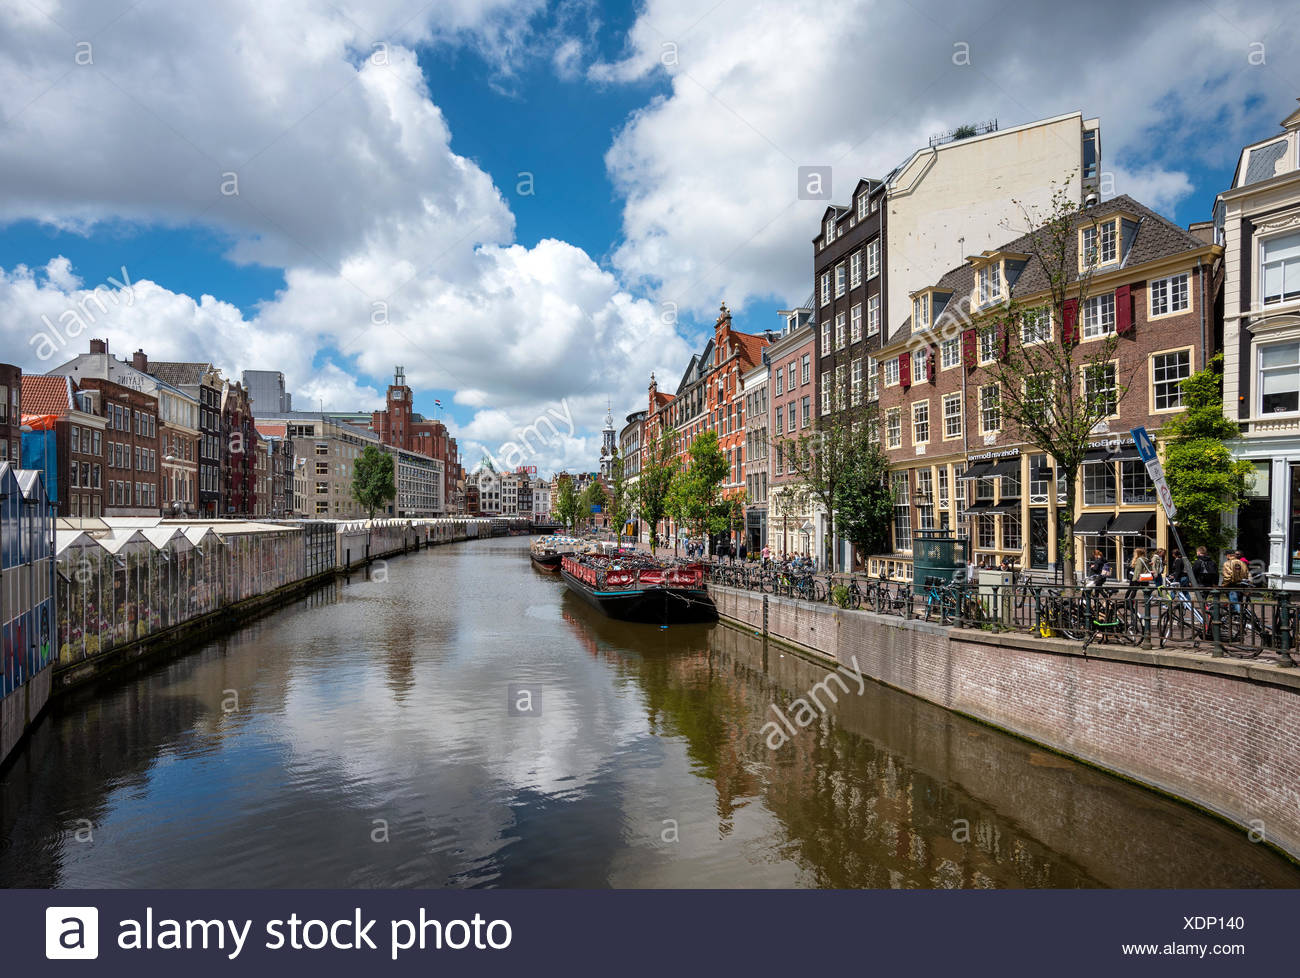 La Singelgracht en Bloomenmarkt, Amsterdam, Holanda Septentrional, Holanda Imagen De Stock